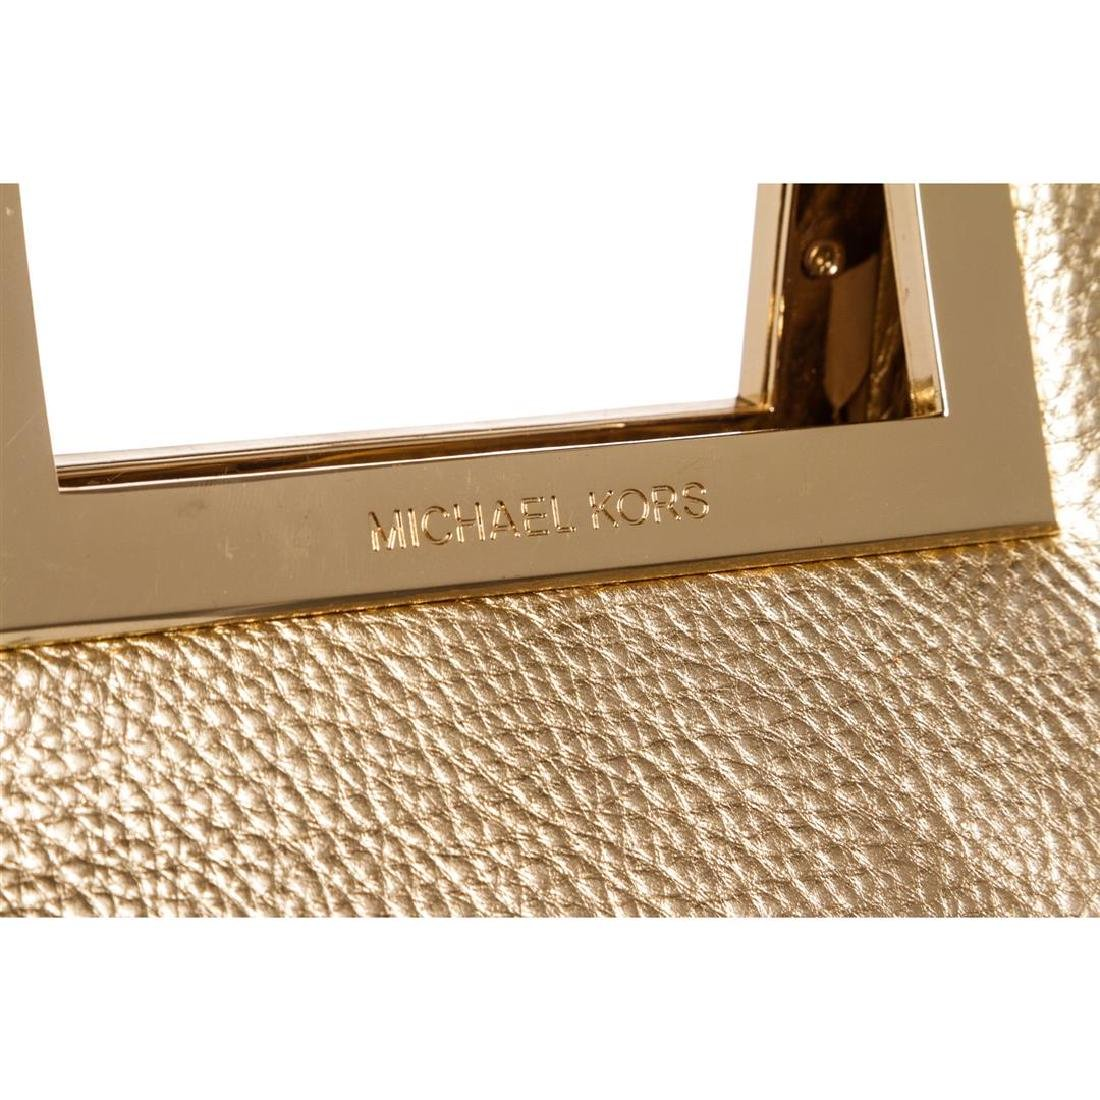 Michael Kors Pale Gold Leather Berkley Clutch Handbag - 4